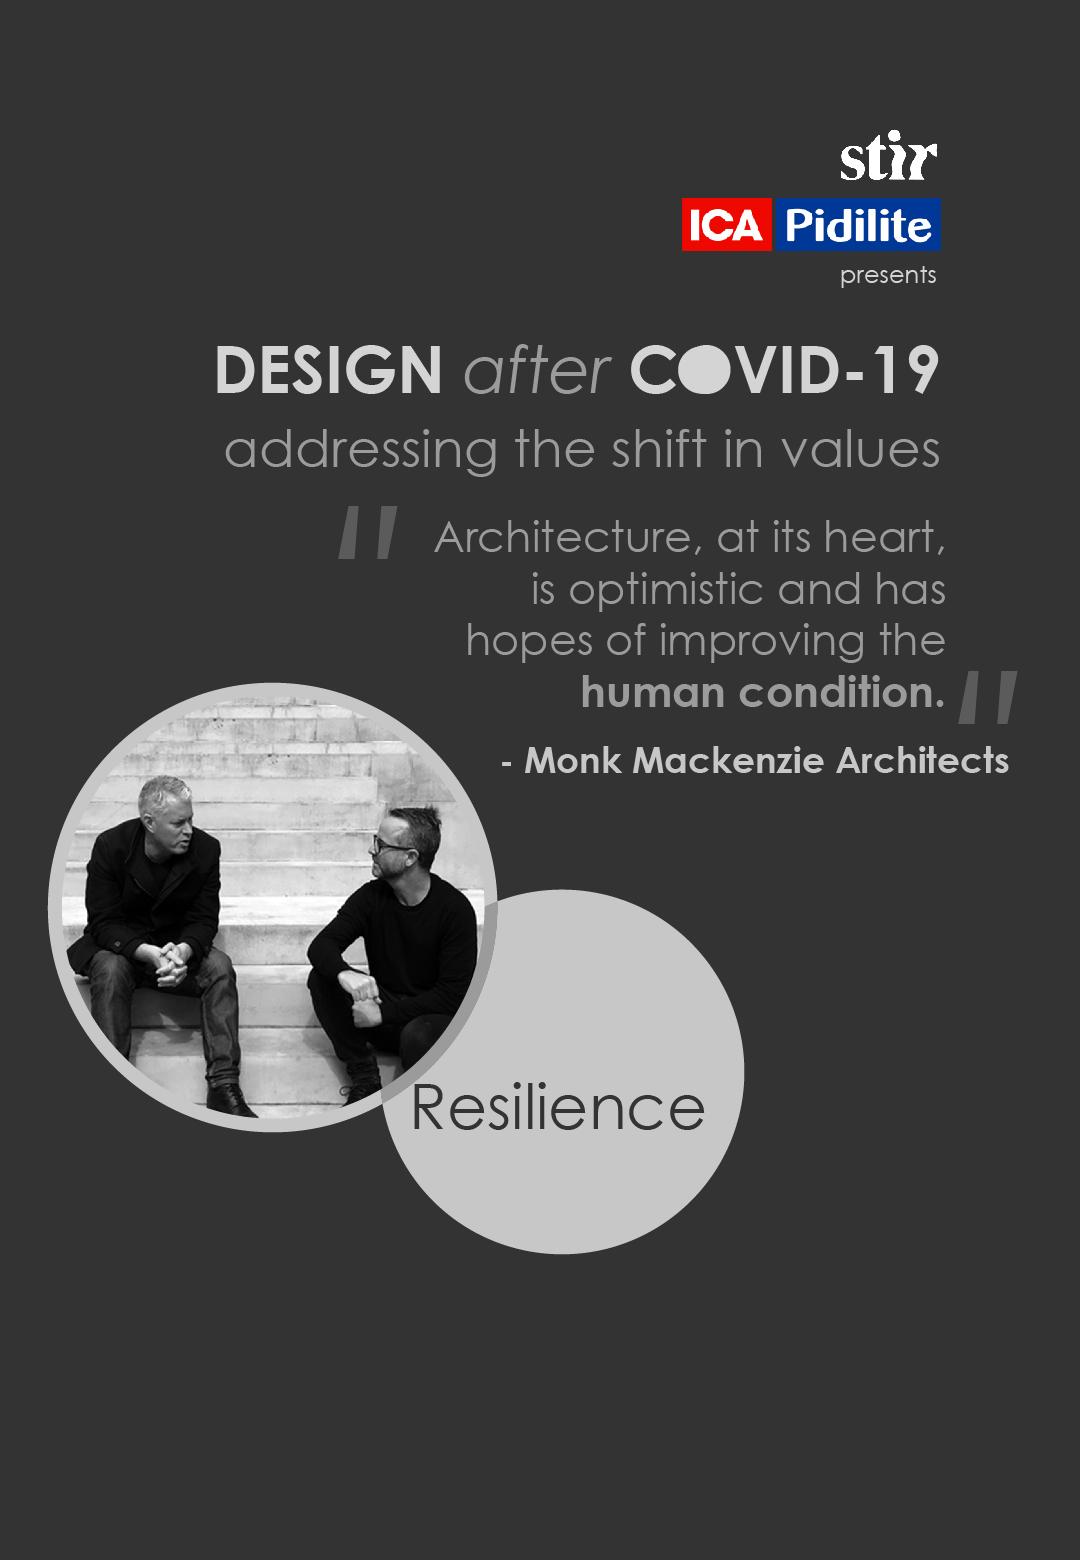 New Zealand-based architects Hamish Monk and Dean Mackenzie on the idea of resilience, adaptation and adoption | Monk Mackenzie architects  | Design after COVID-19 | STIRworld